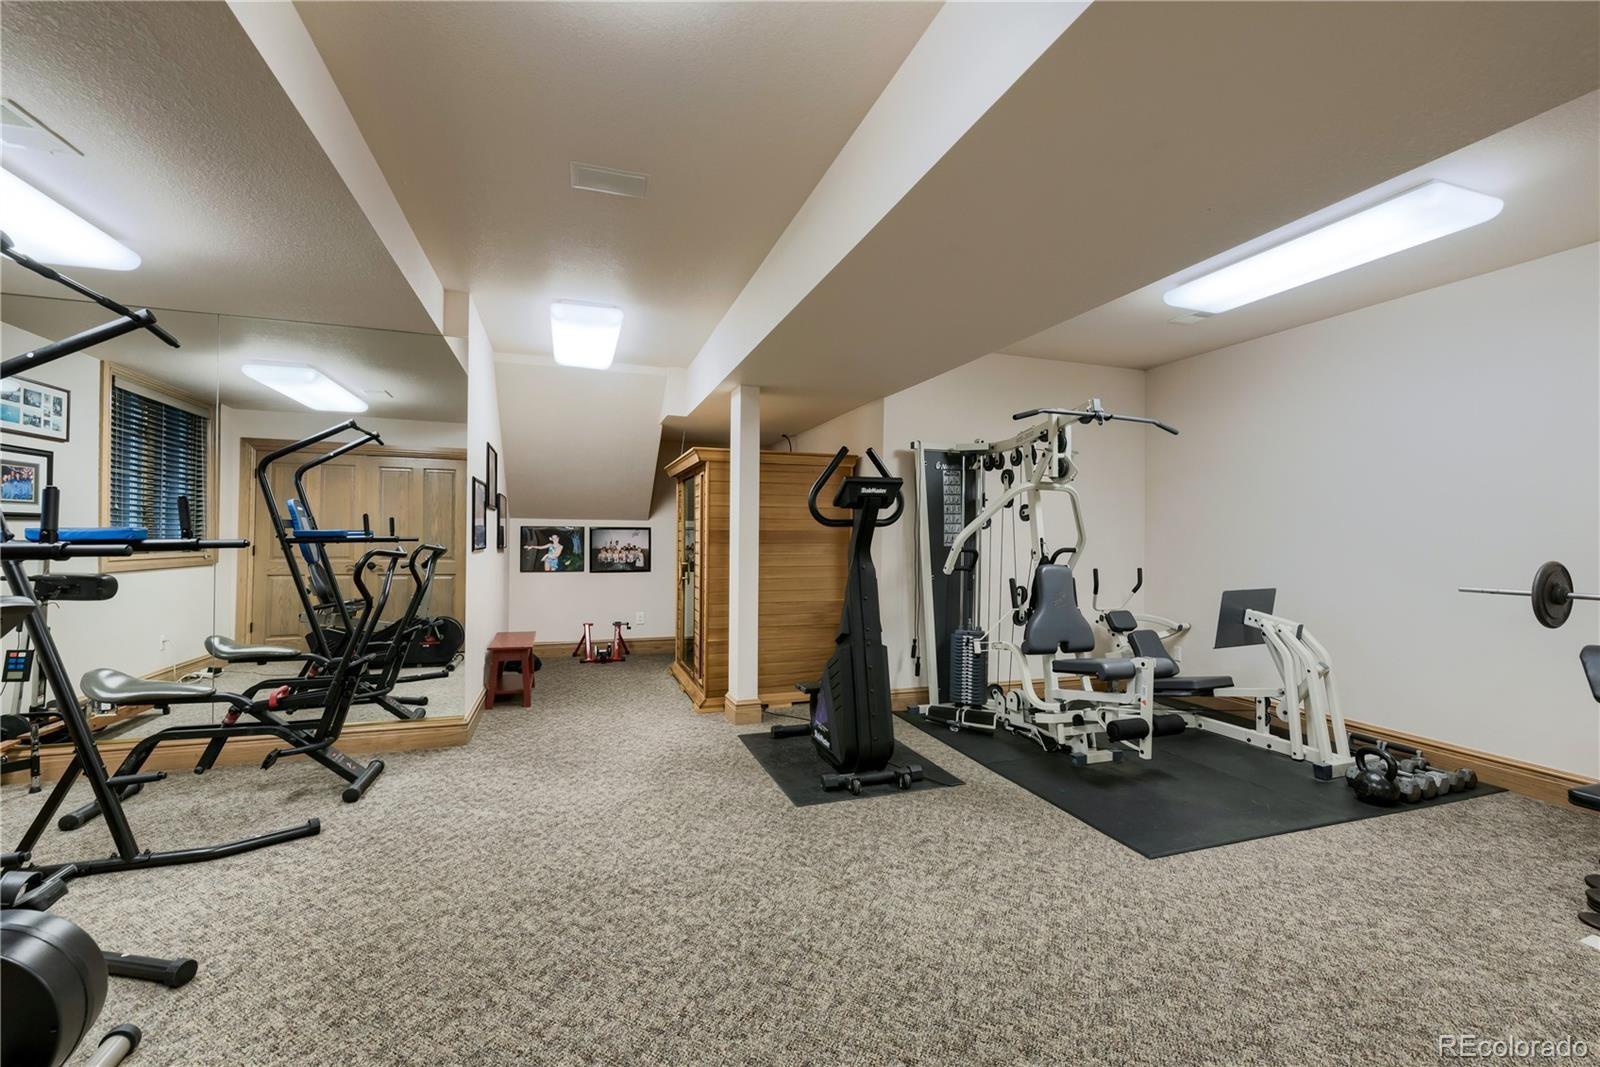 MLS# 2964584 - 31 - 5730 Ridgeway Drive, Fort Collins, CO 80528